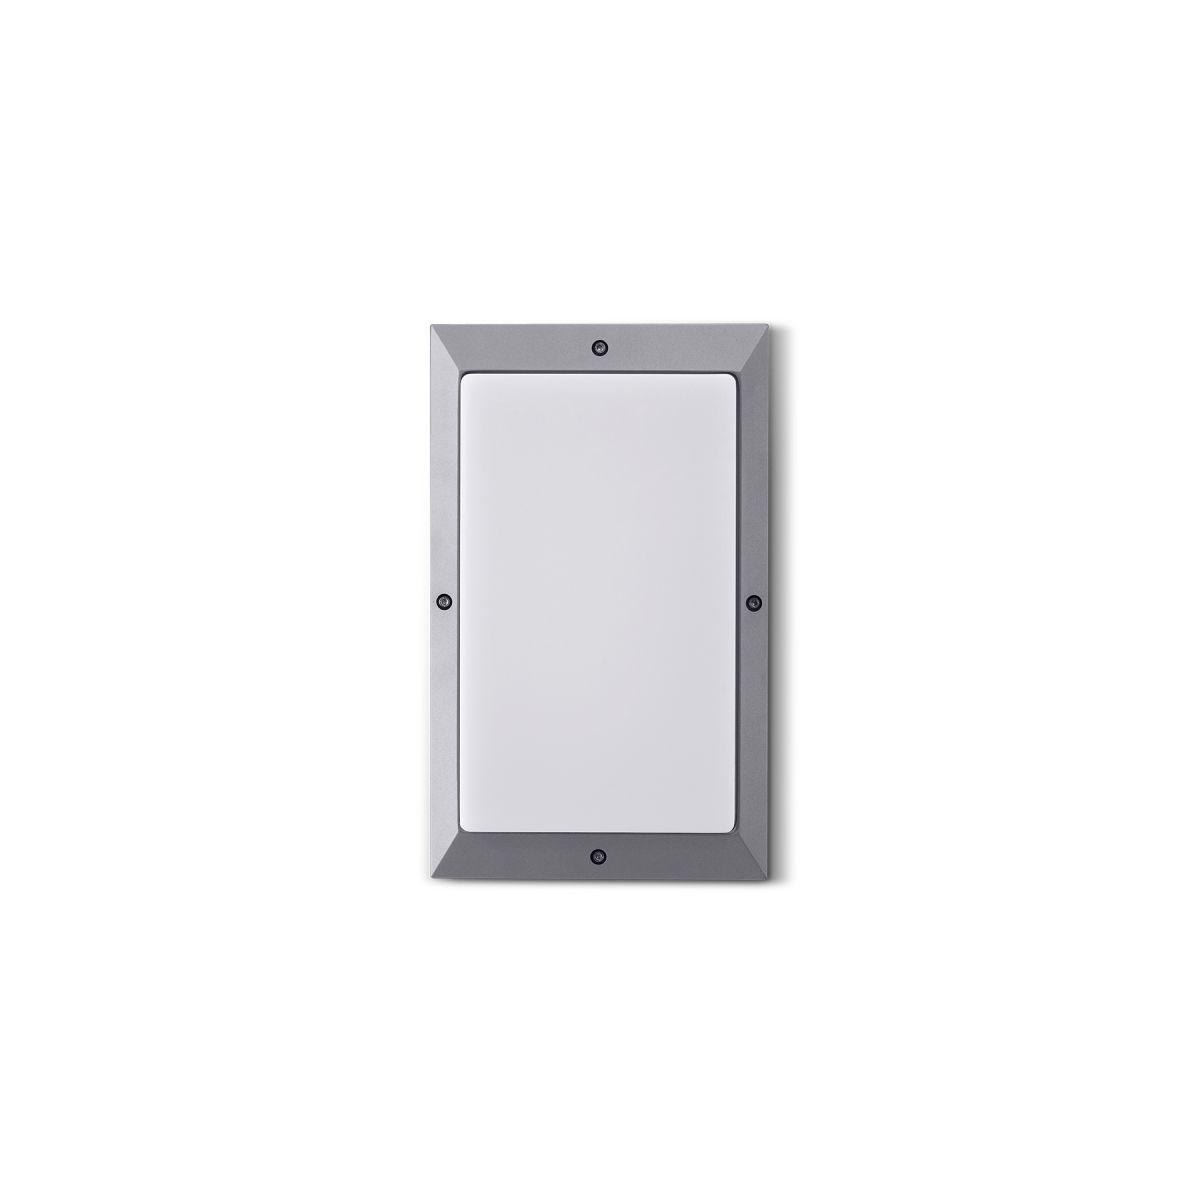 XEON Flat - Wall Light